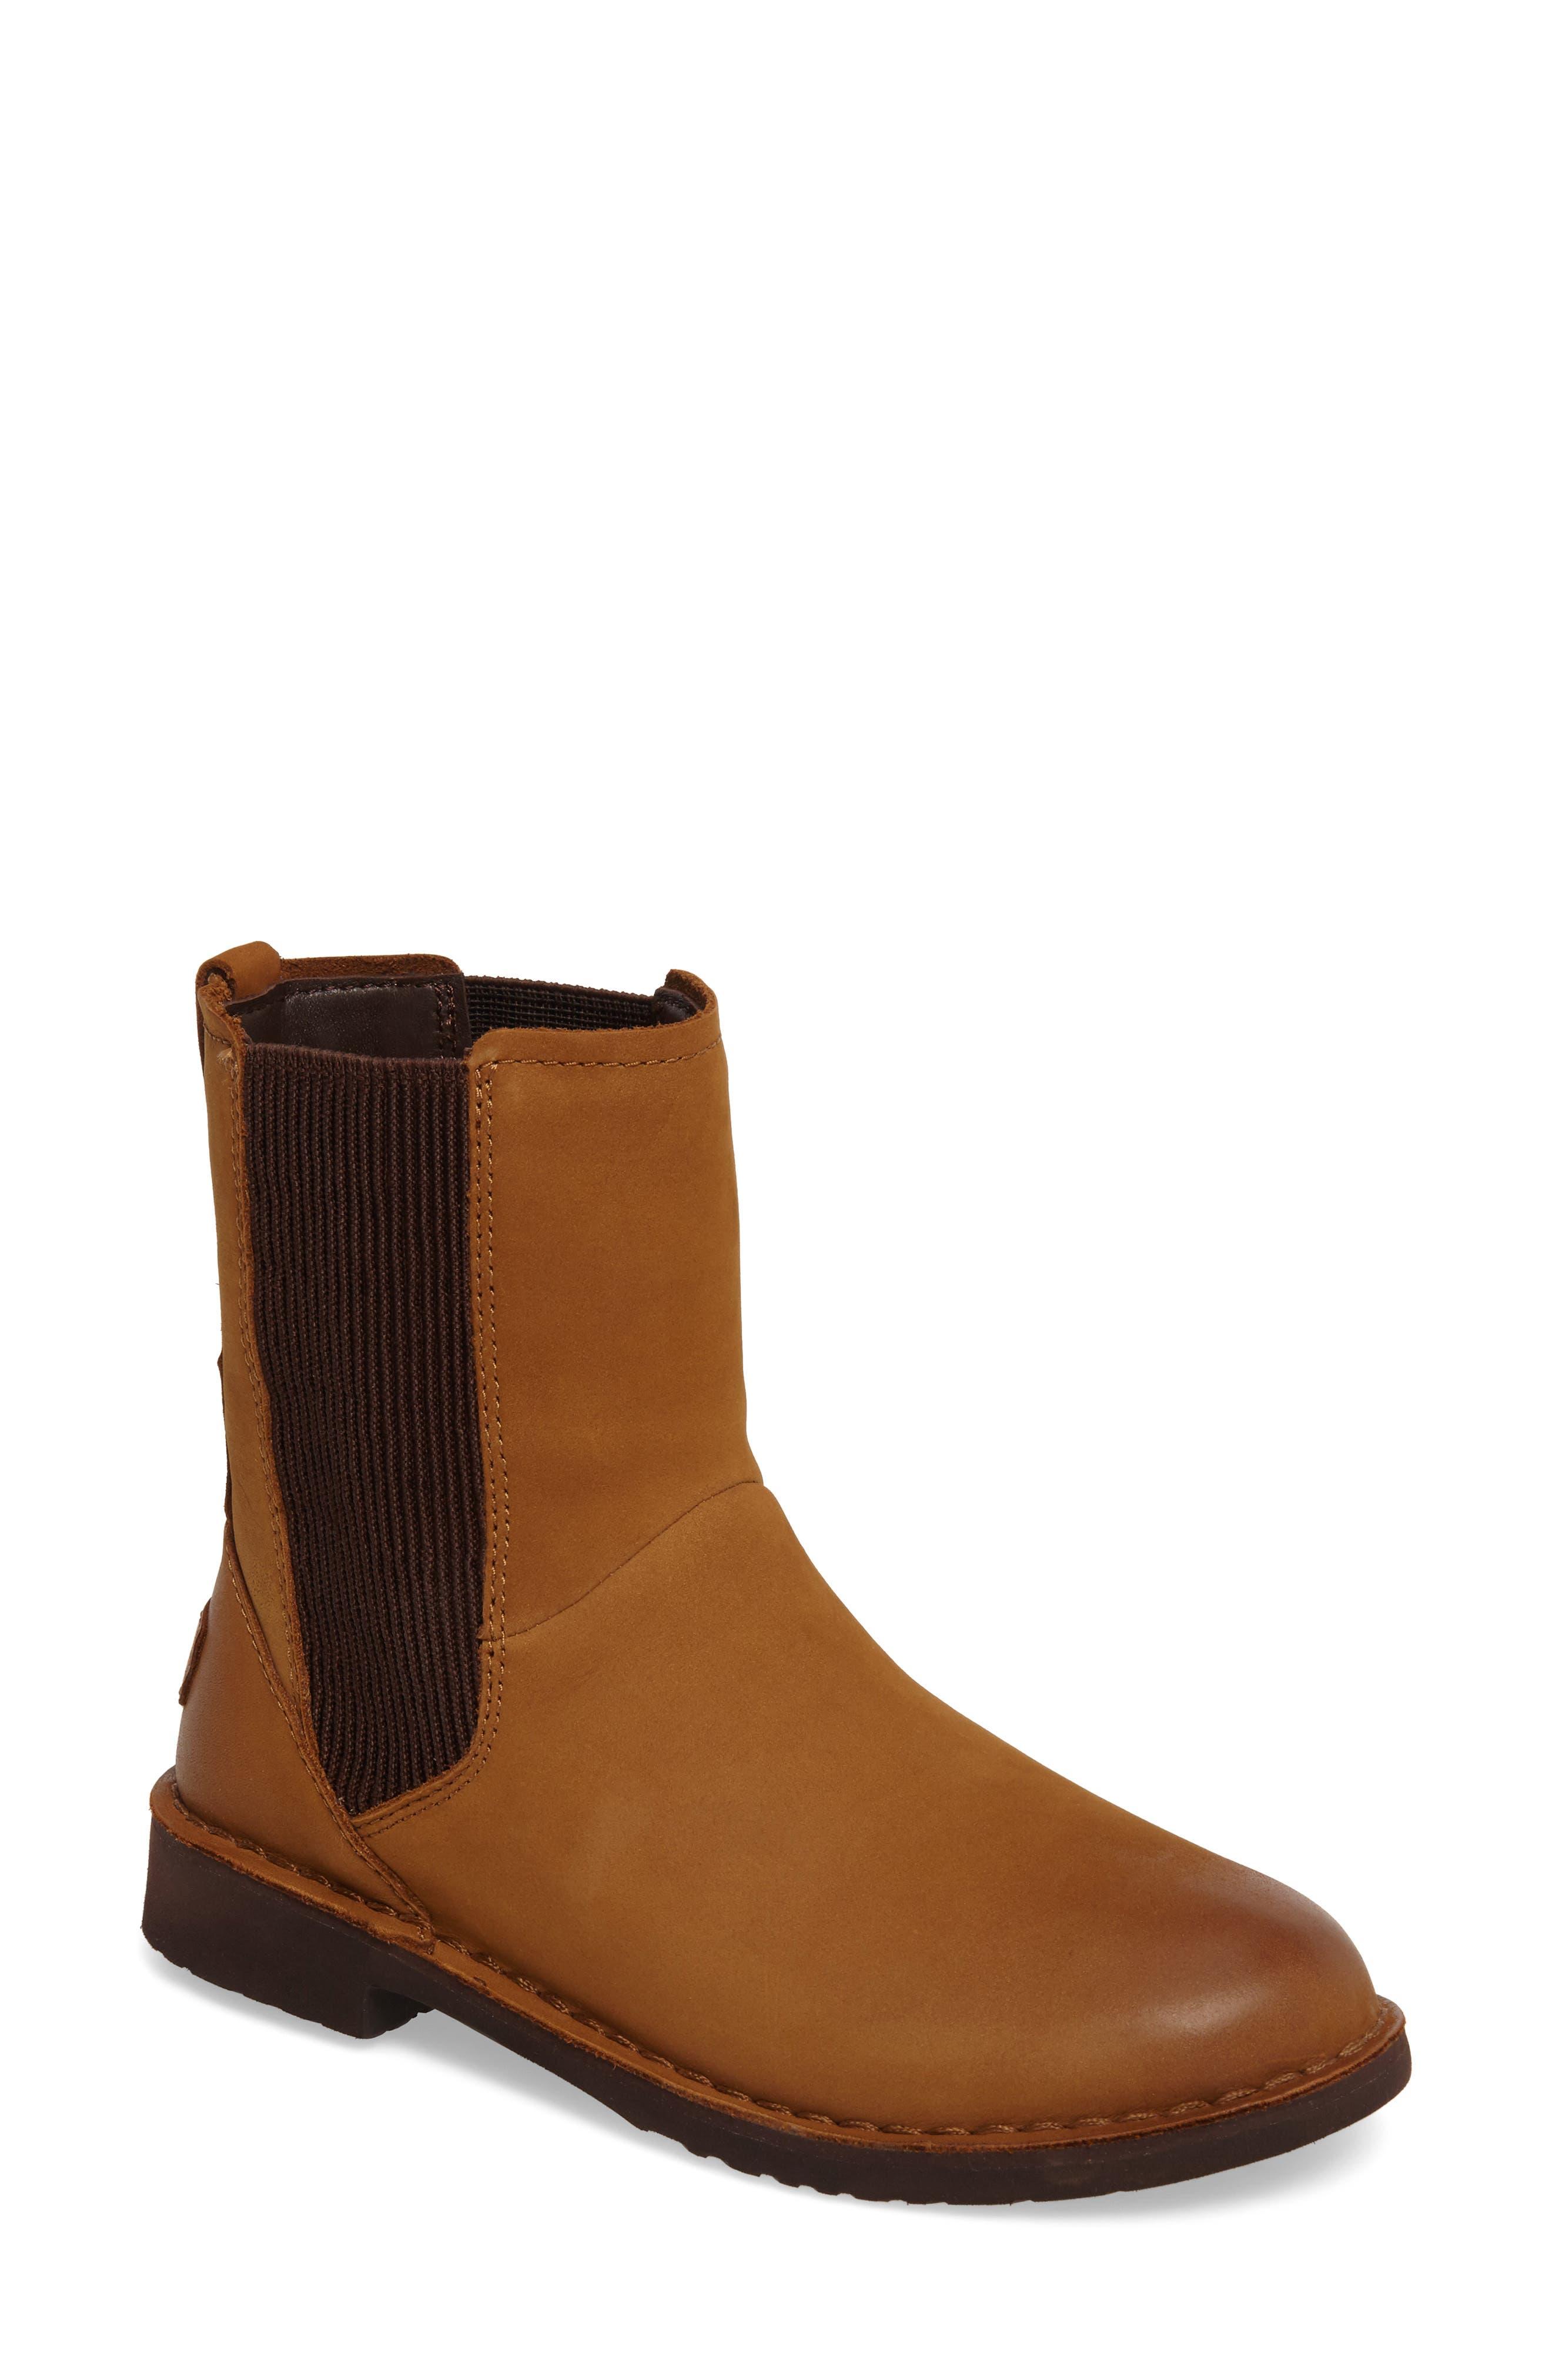 Larra Boot,                             Main thumbnail 1, color,                             Chestnut Nubuck Leather